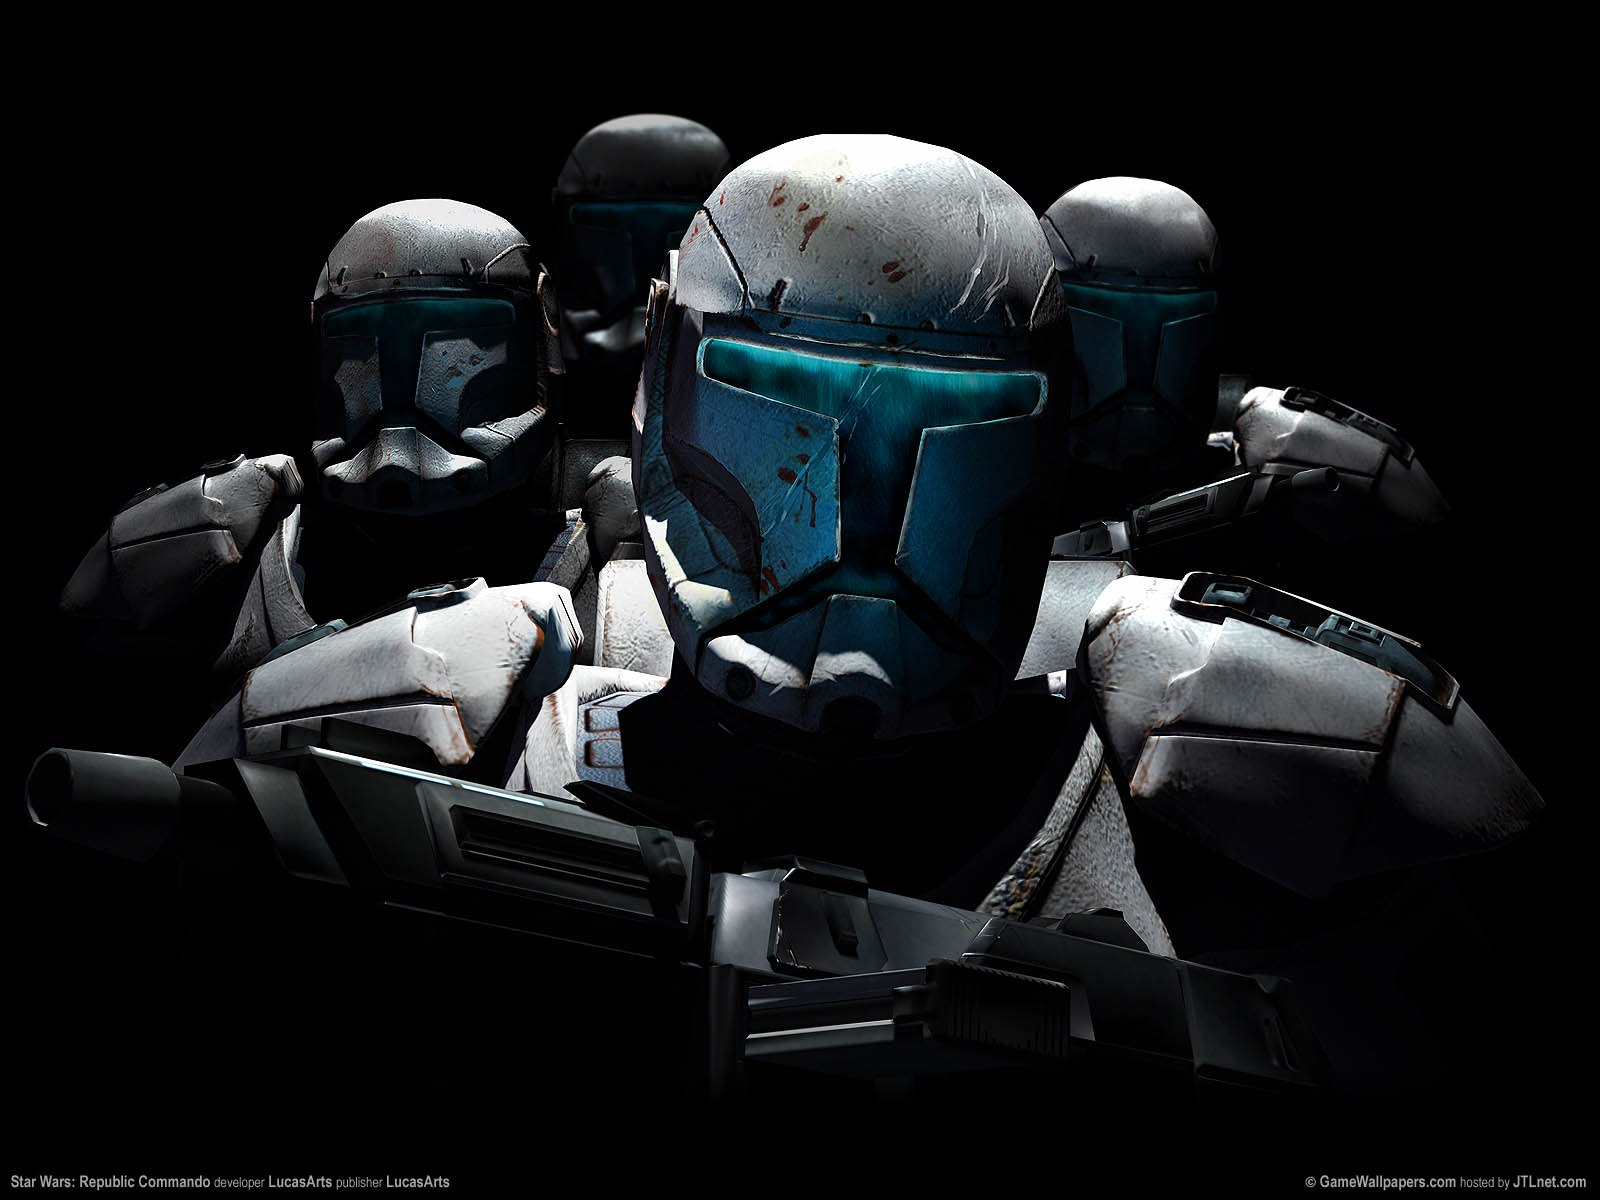 Star wars republic commando order 66 - 8205